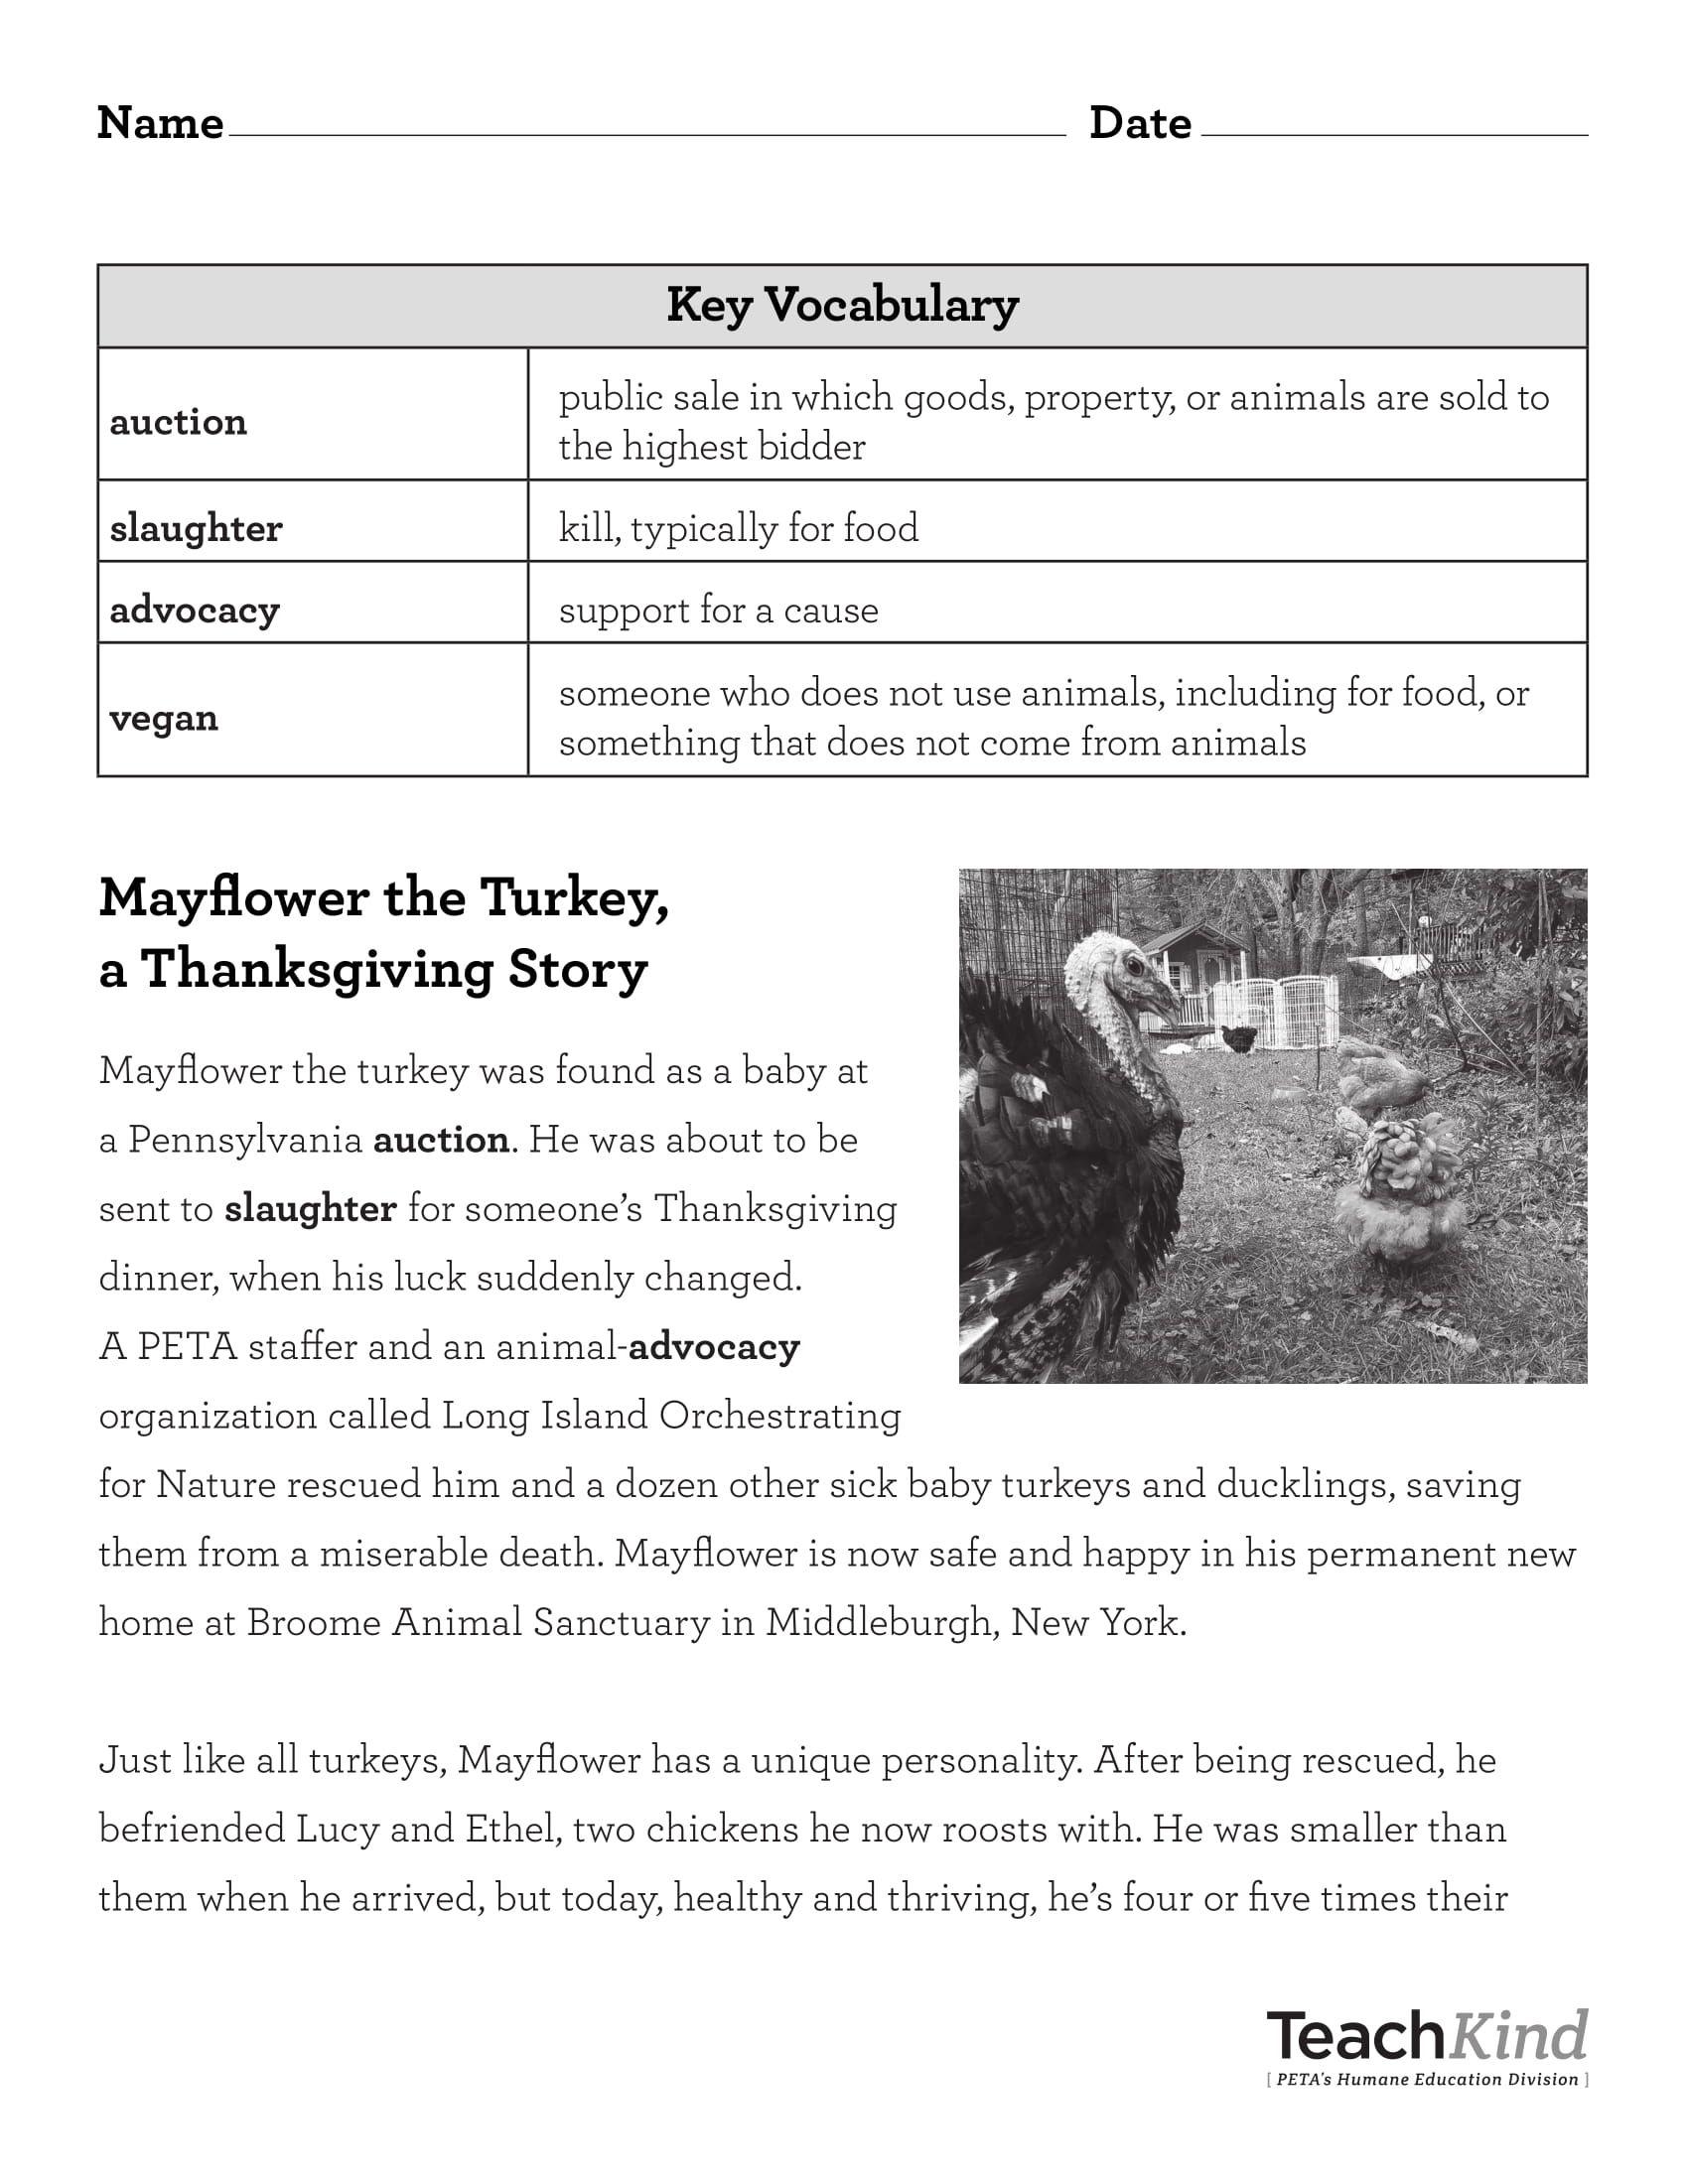 Teachkind Rescue Stories Mayflower The Turkey